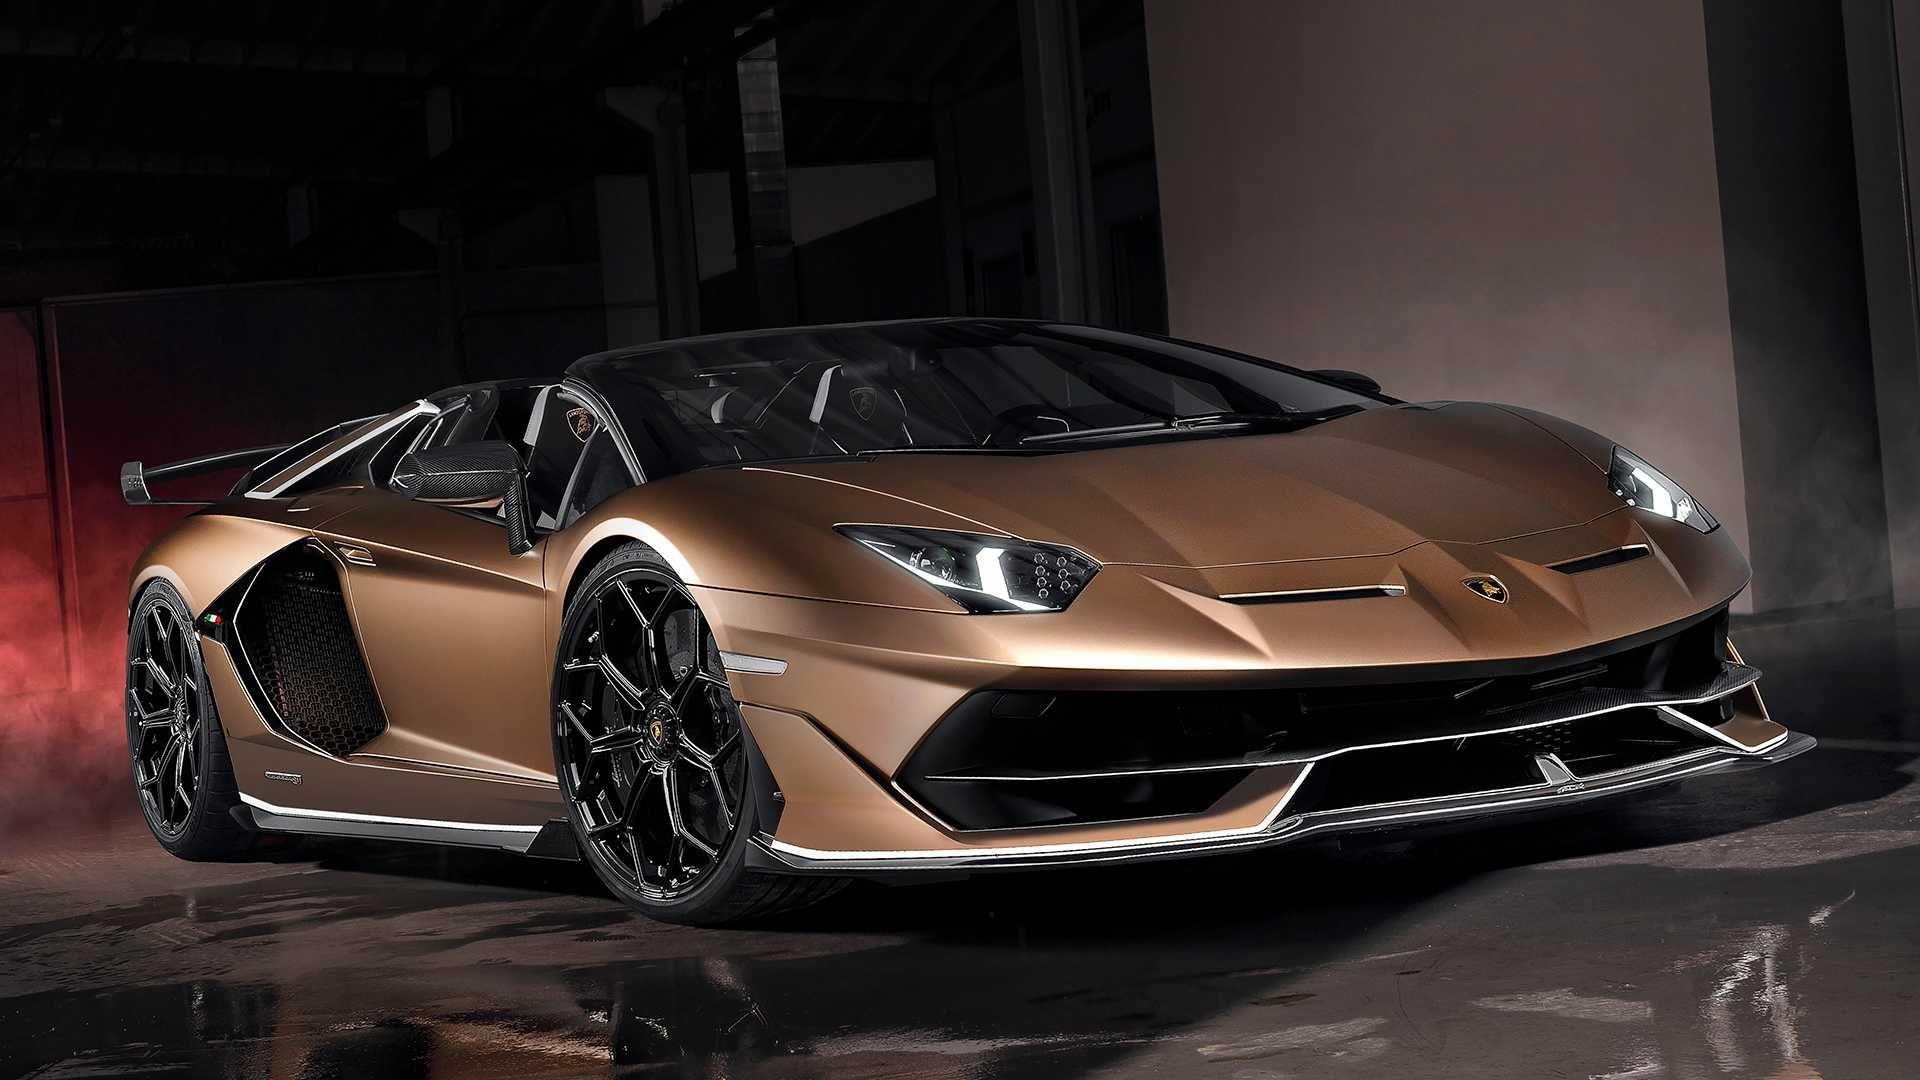 Lamborghini Aventador Svj Roadster News And Reviews Motor1 Com Lamborghini Aventador Roadsters Lamborghini Dealership